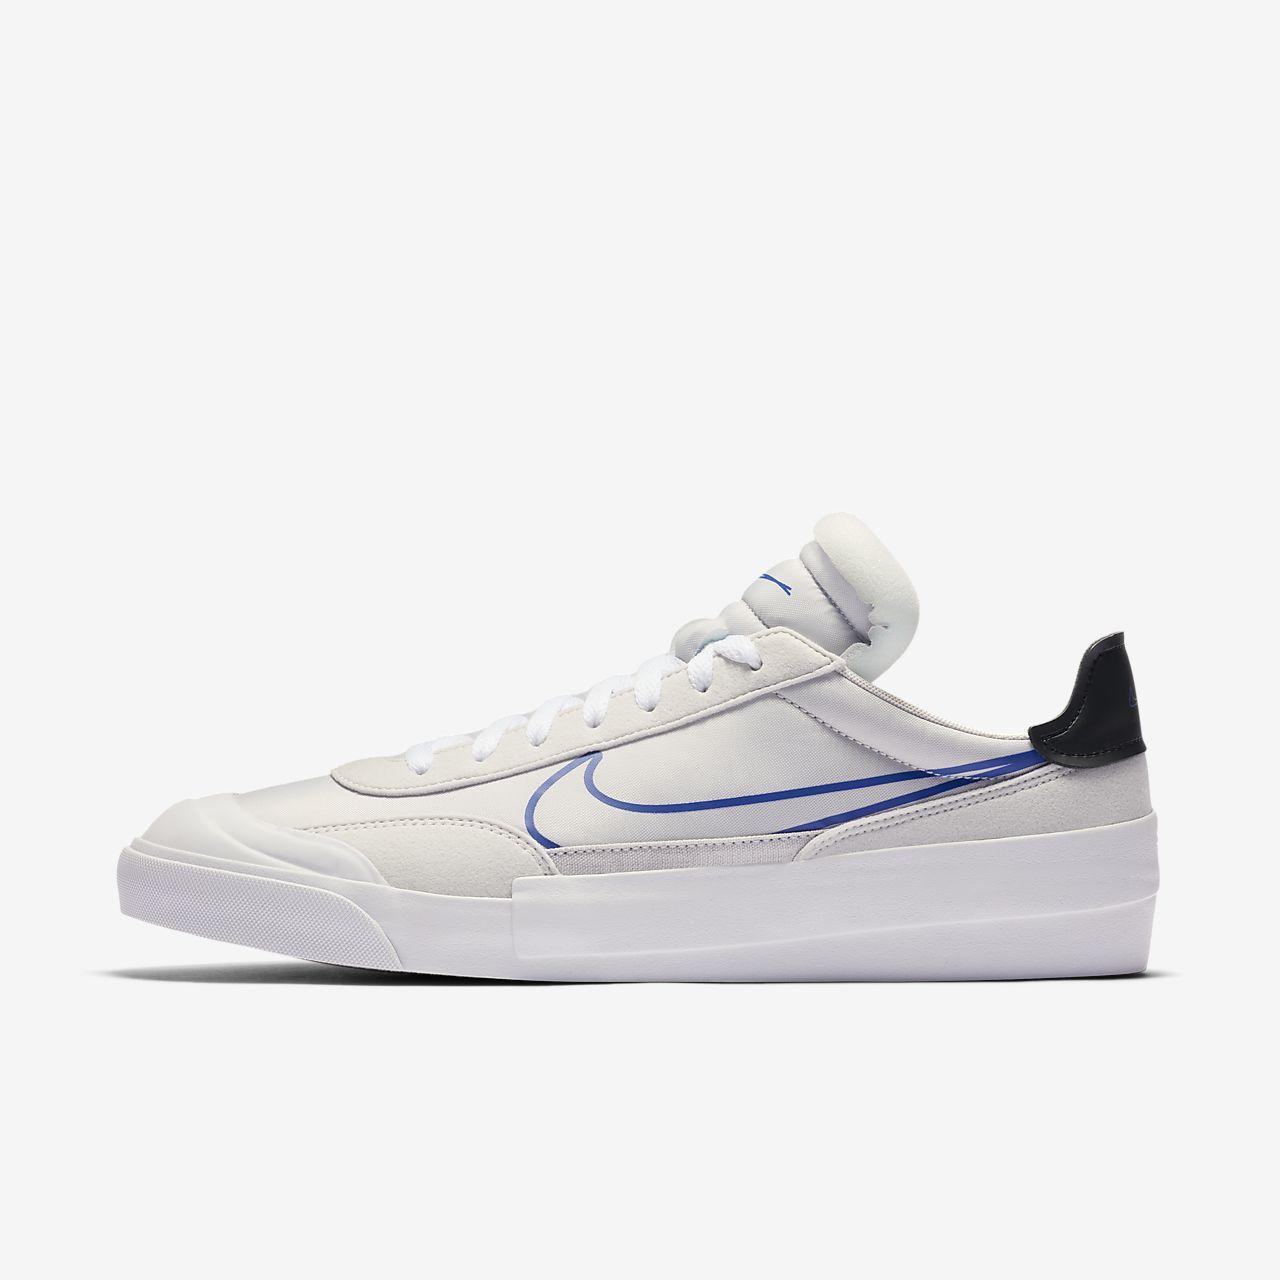 Nike Drop Type cipő